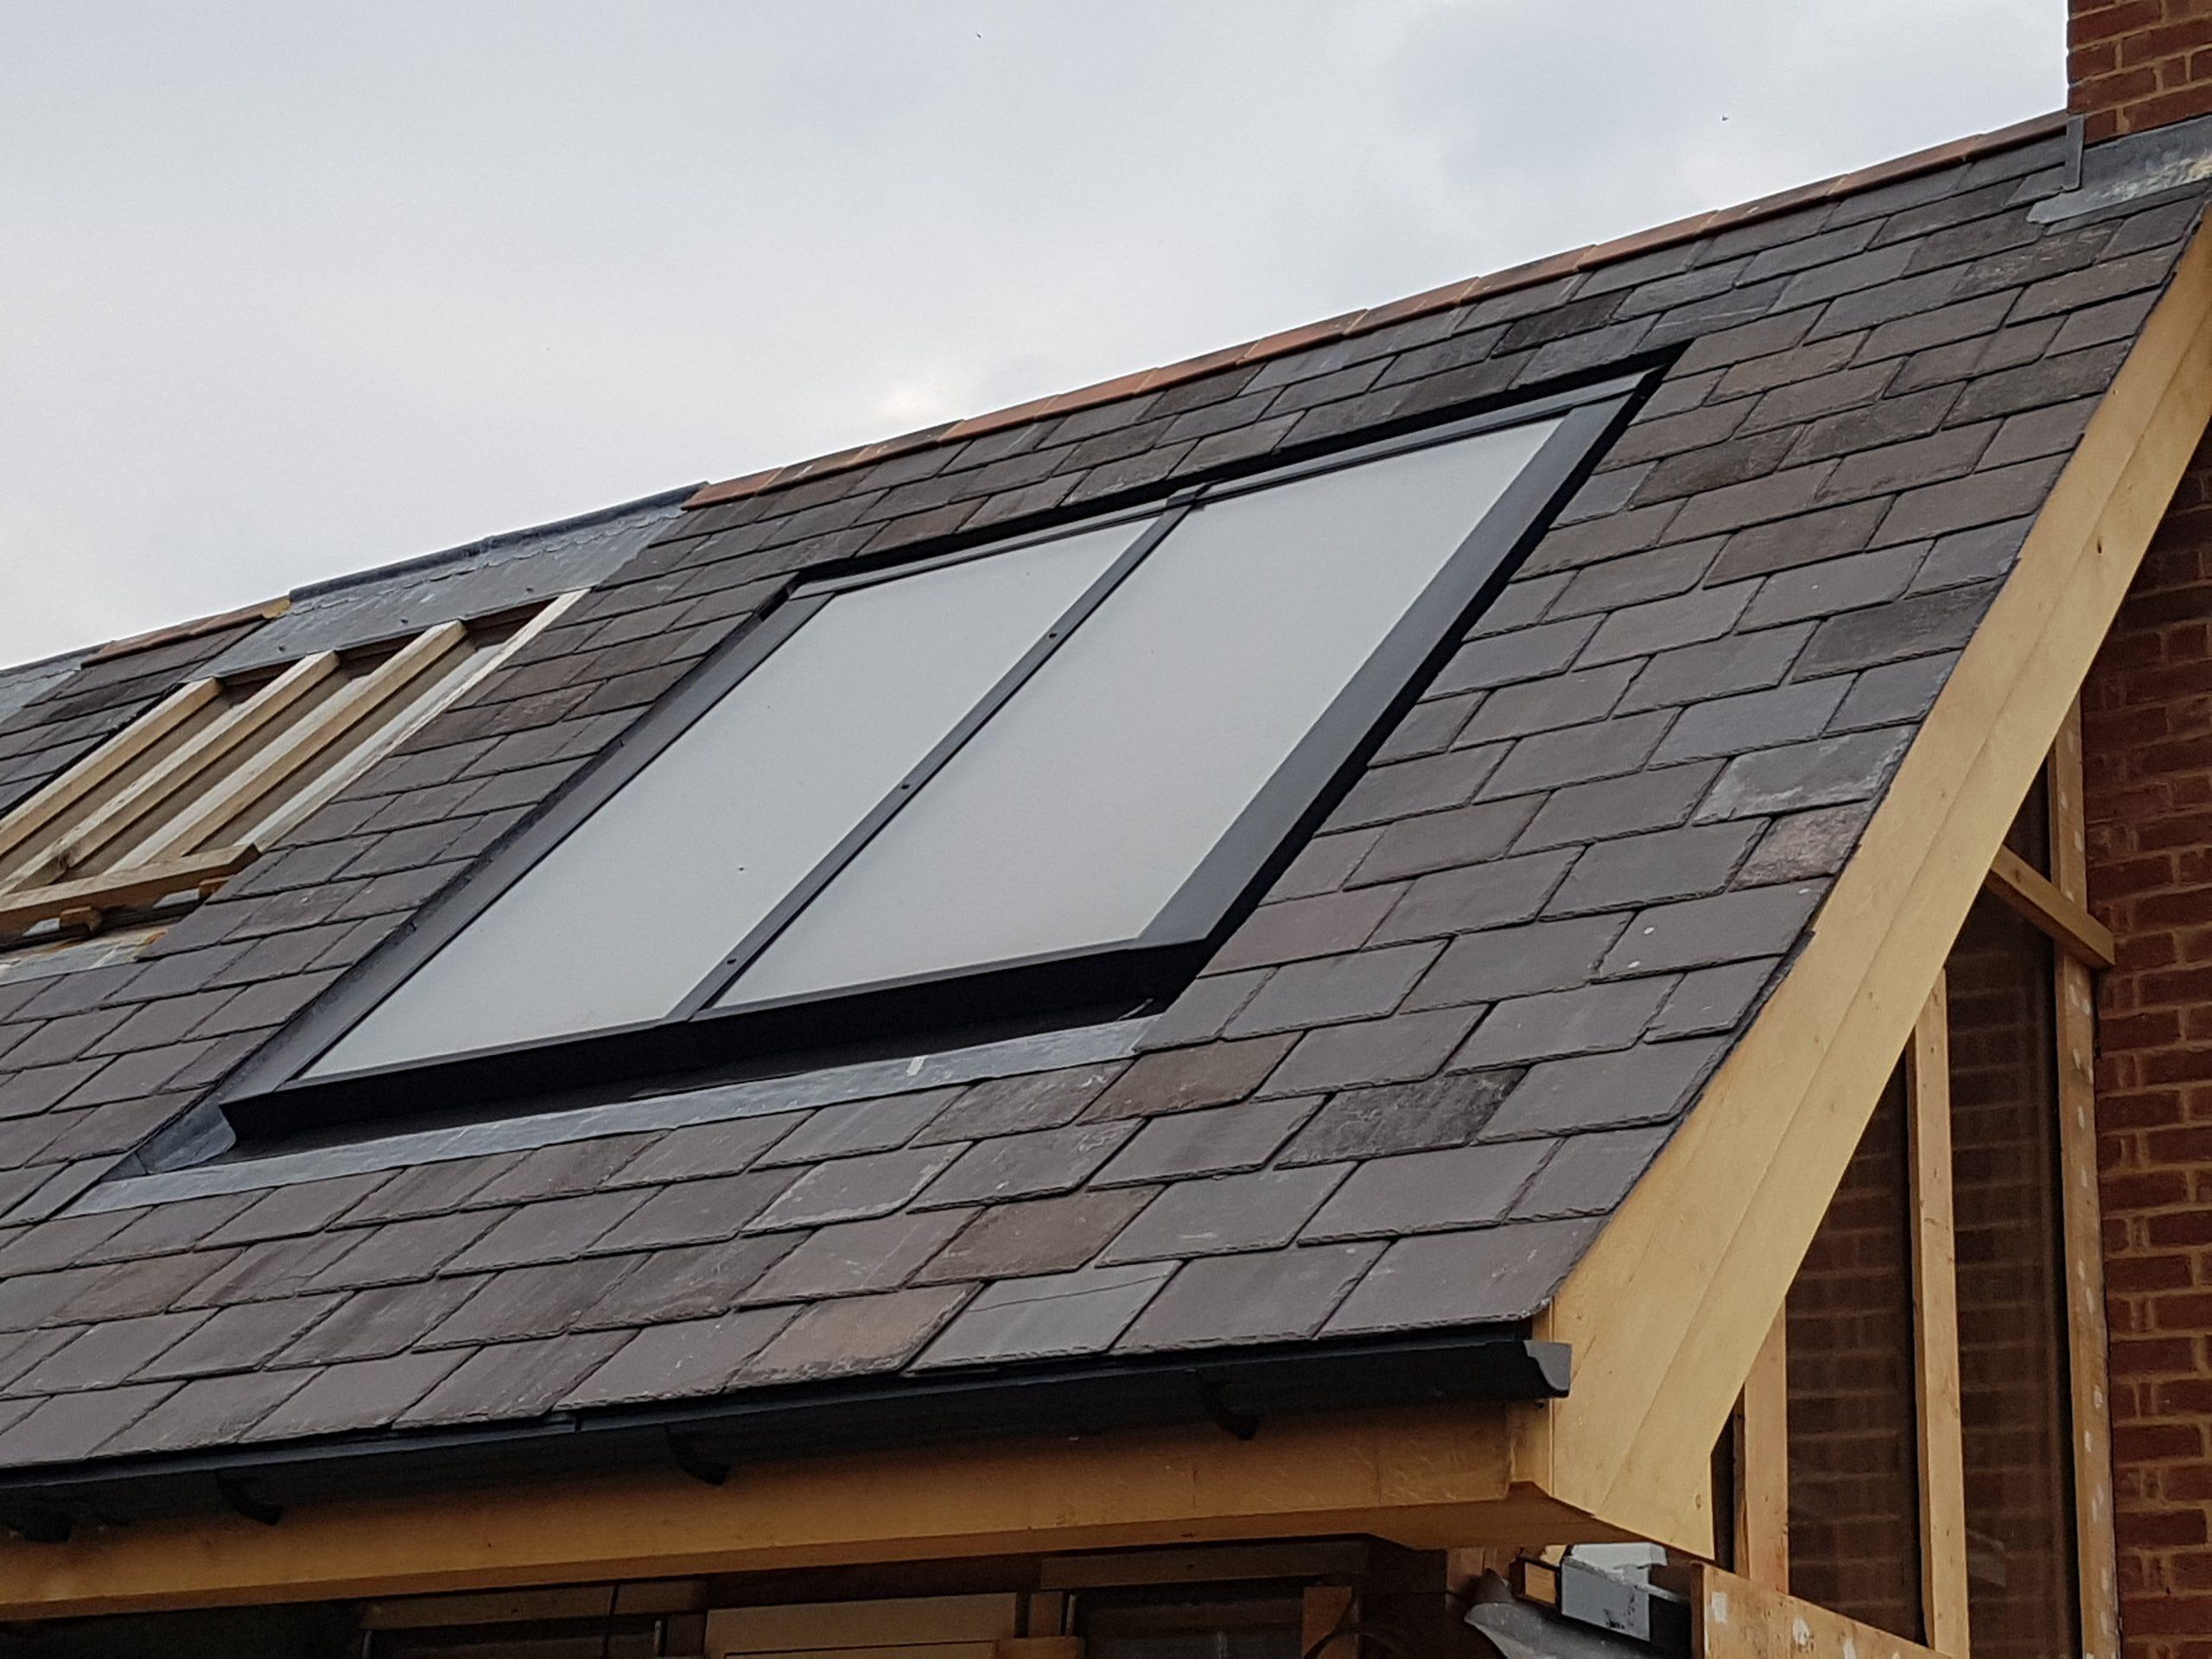 Viessmann flat panels in roof